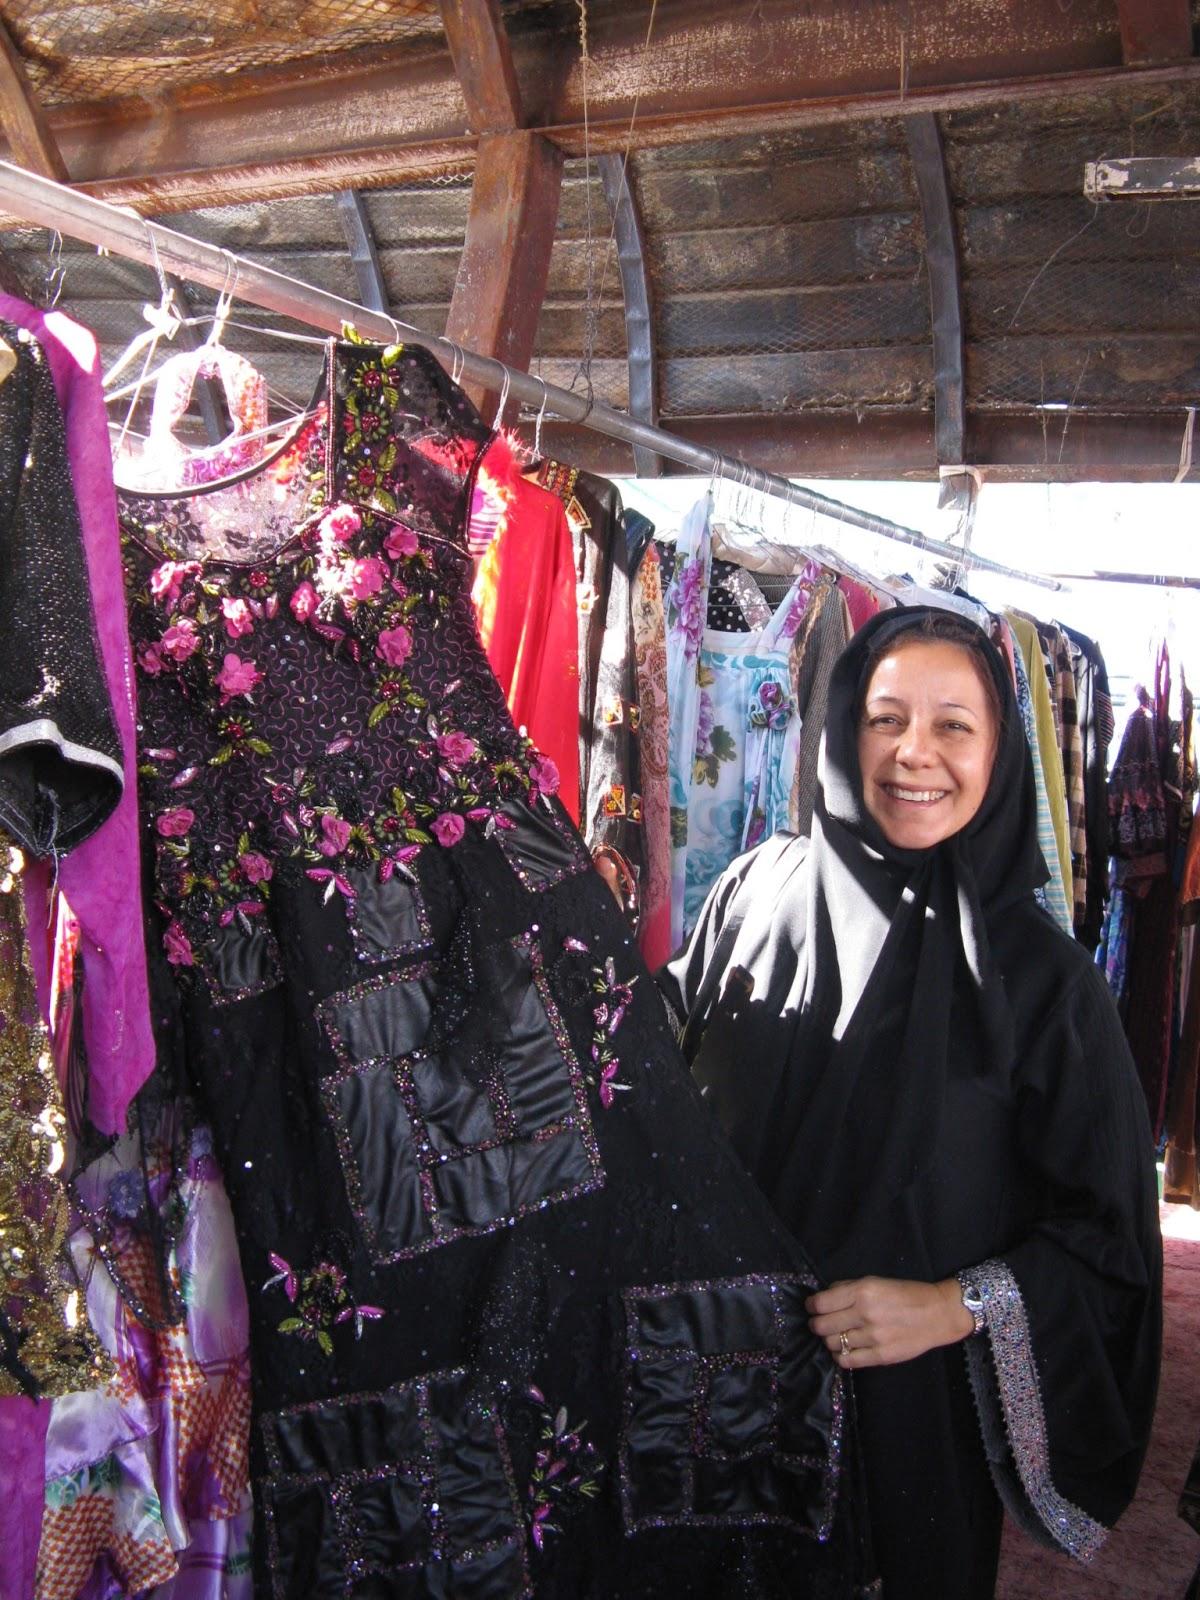 Princess Souq • Kiwi Living In Saudi